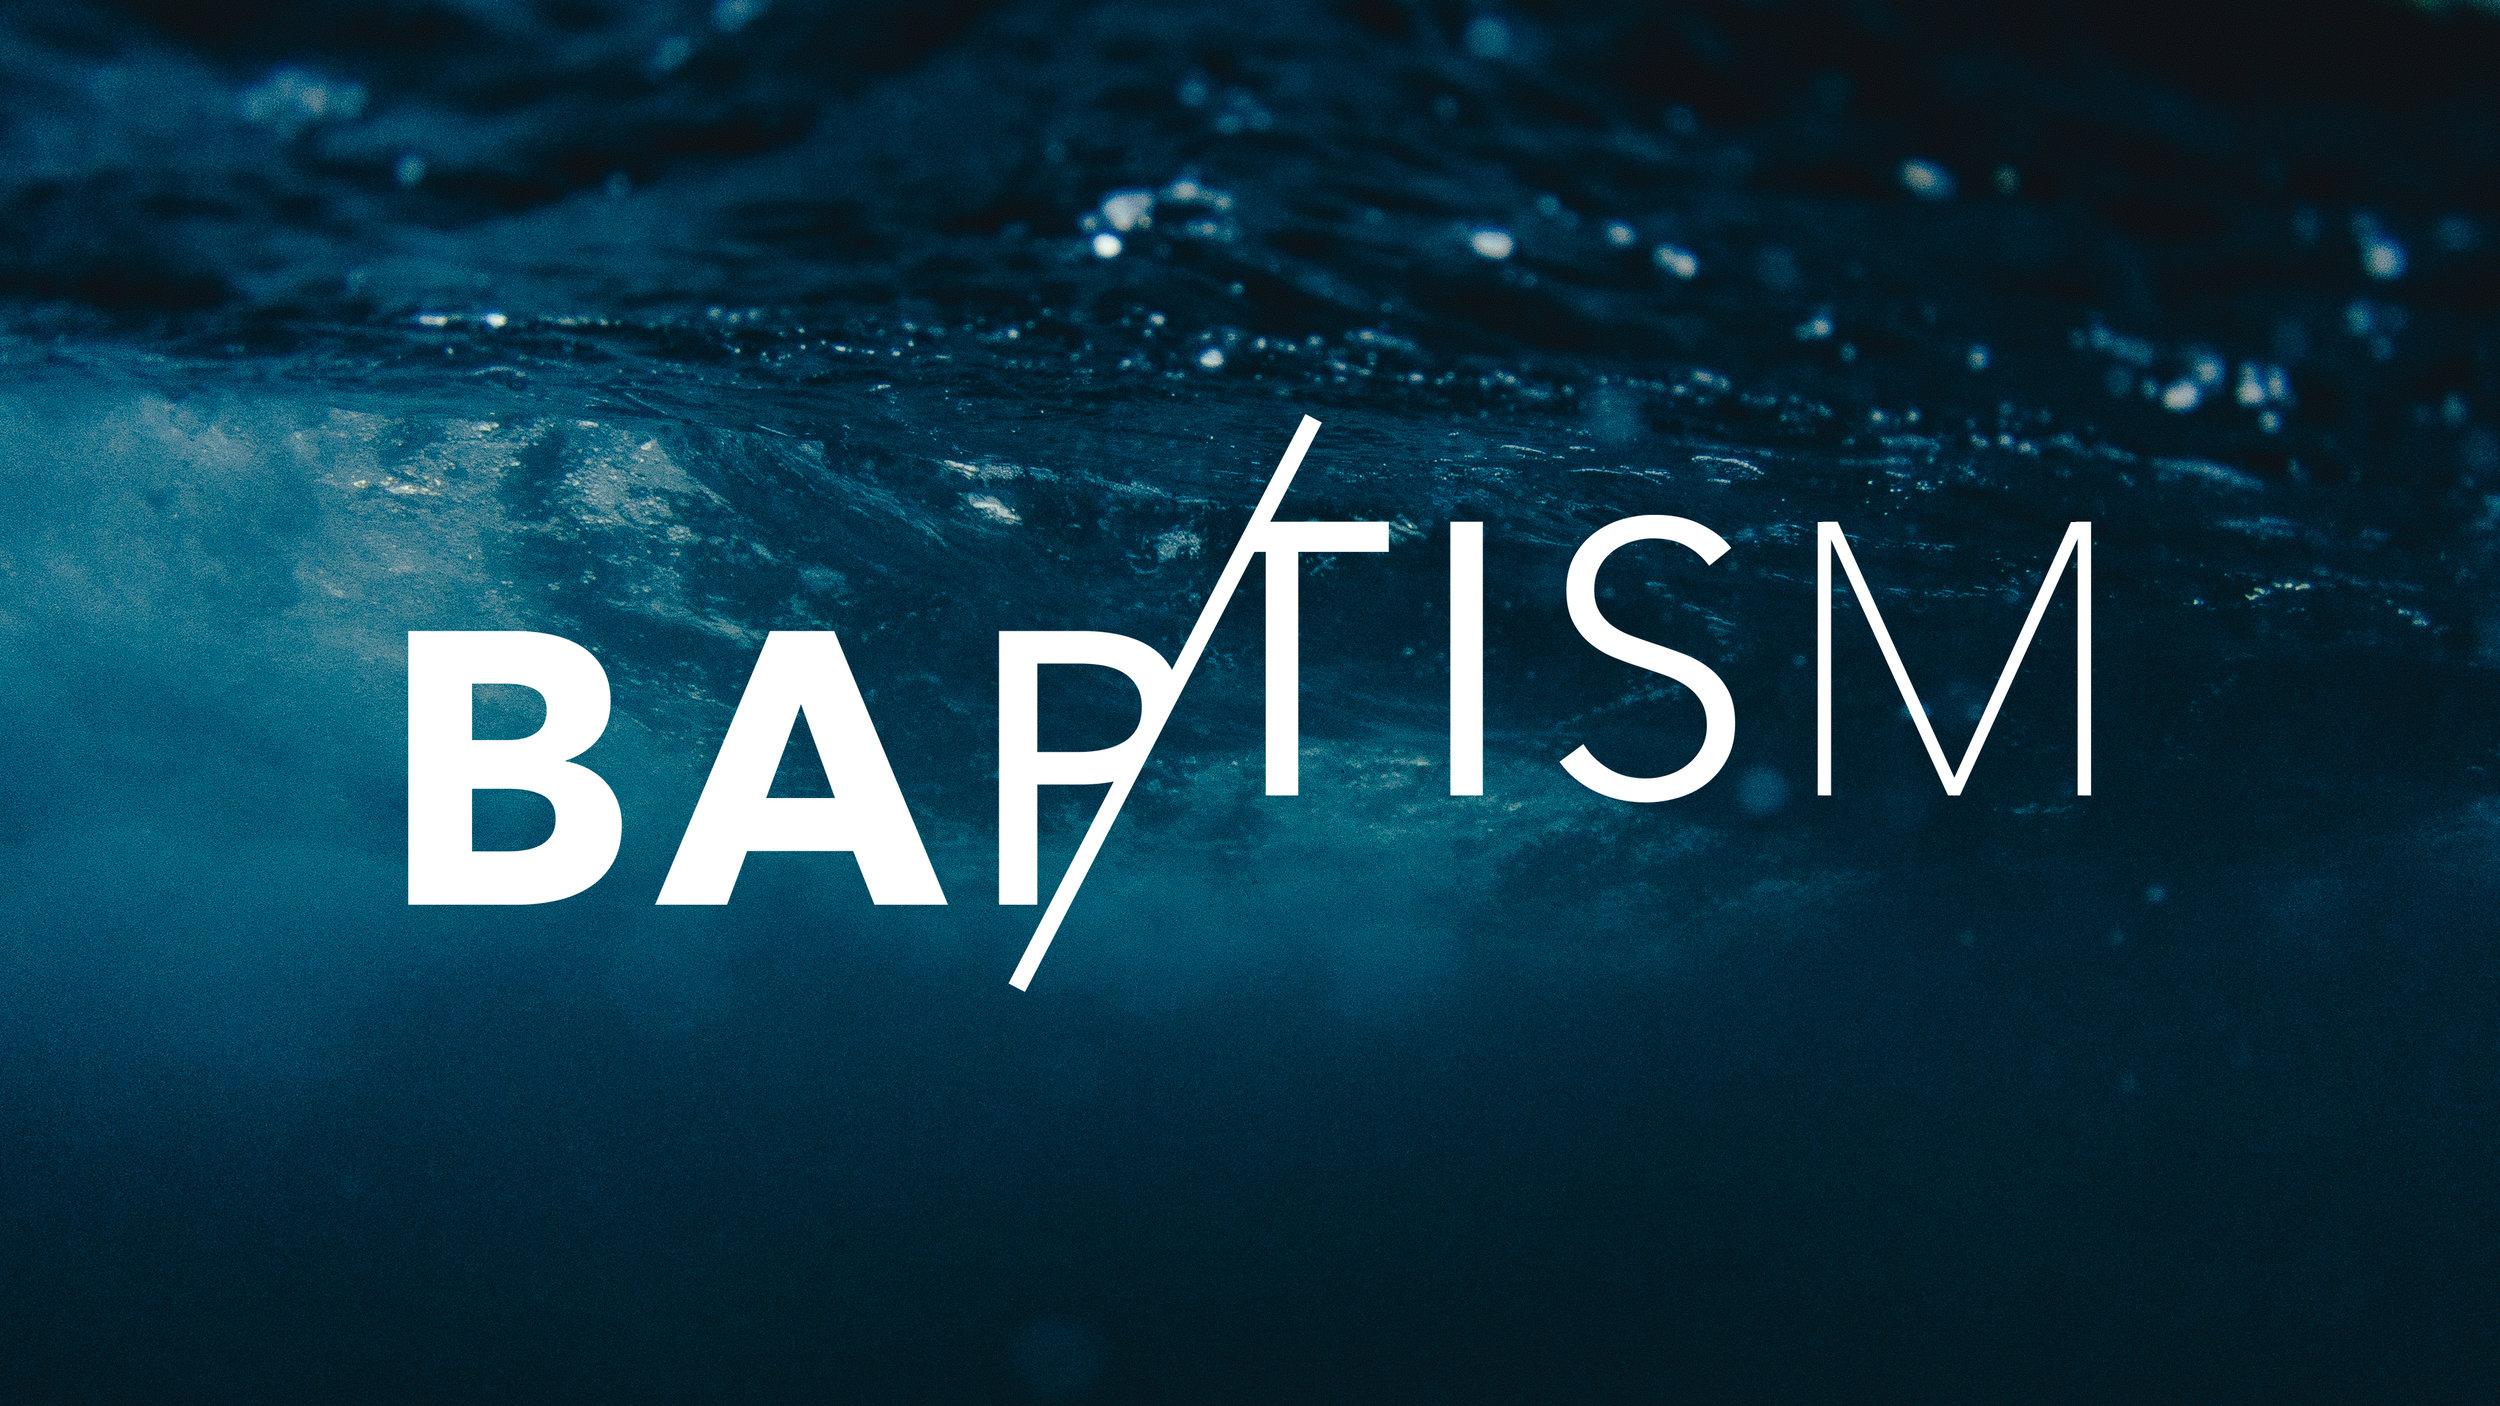 Baptism_SCREEN_2017.jpg